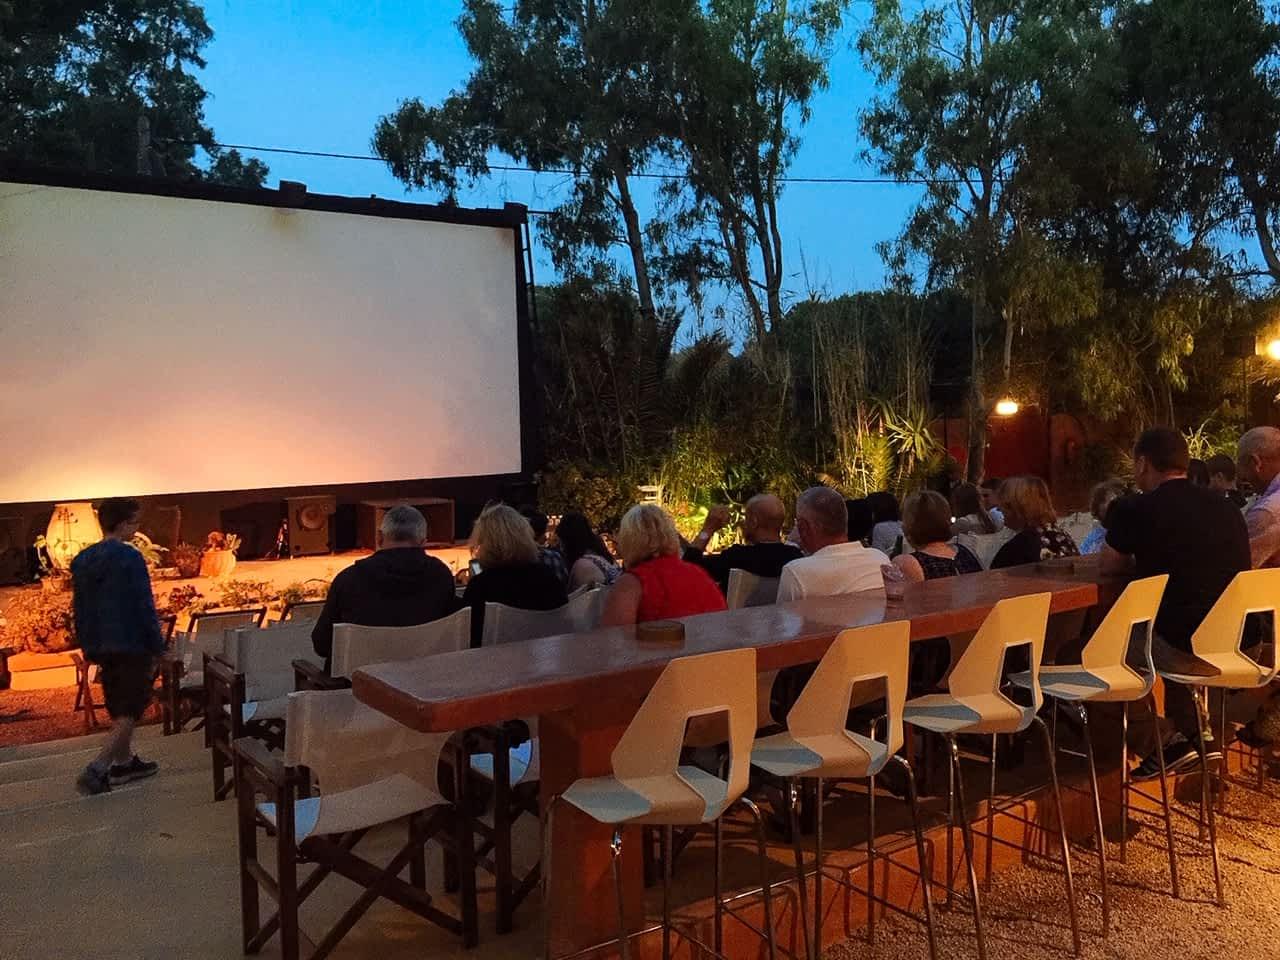 Reasons to visit Santorini - Outdoor Cinema